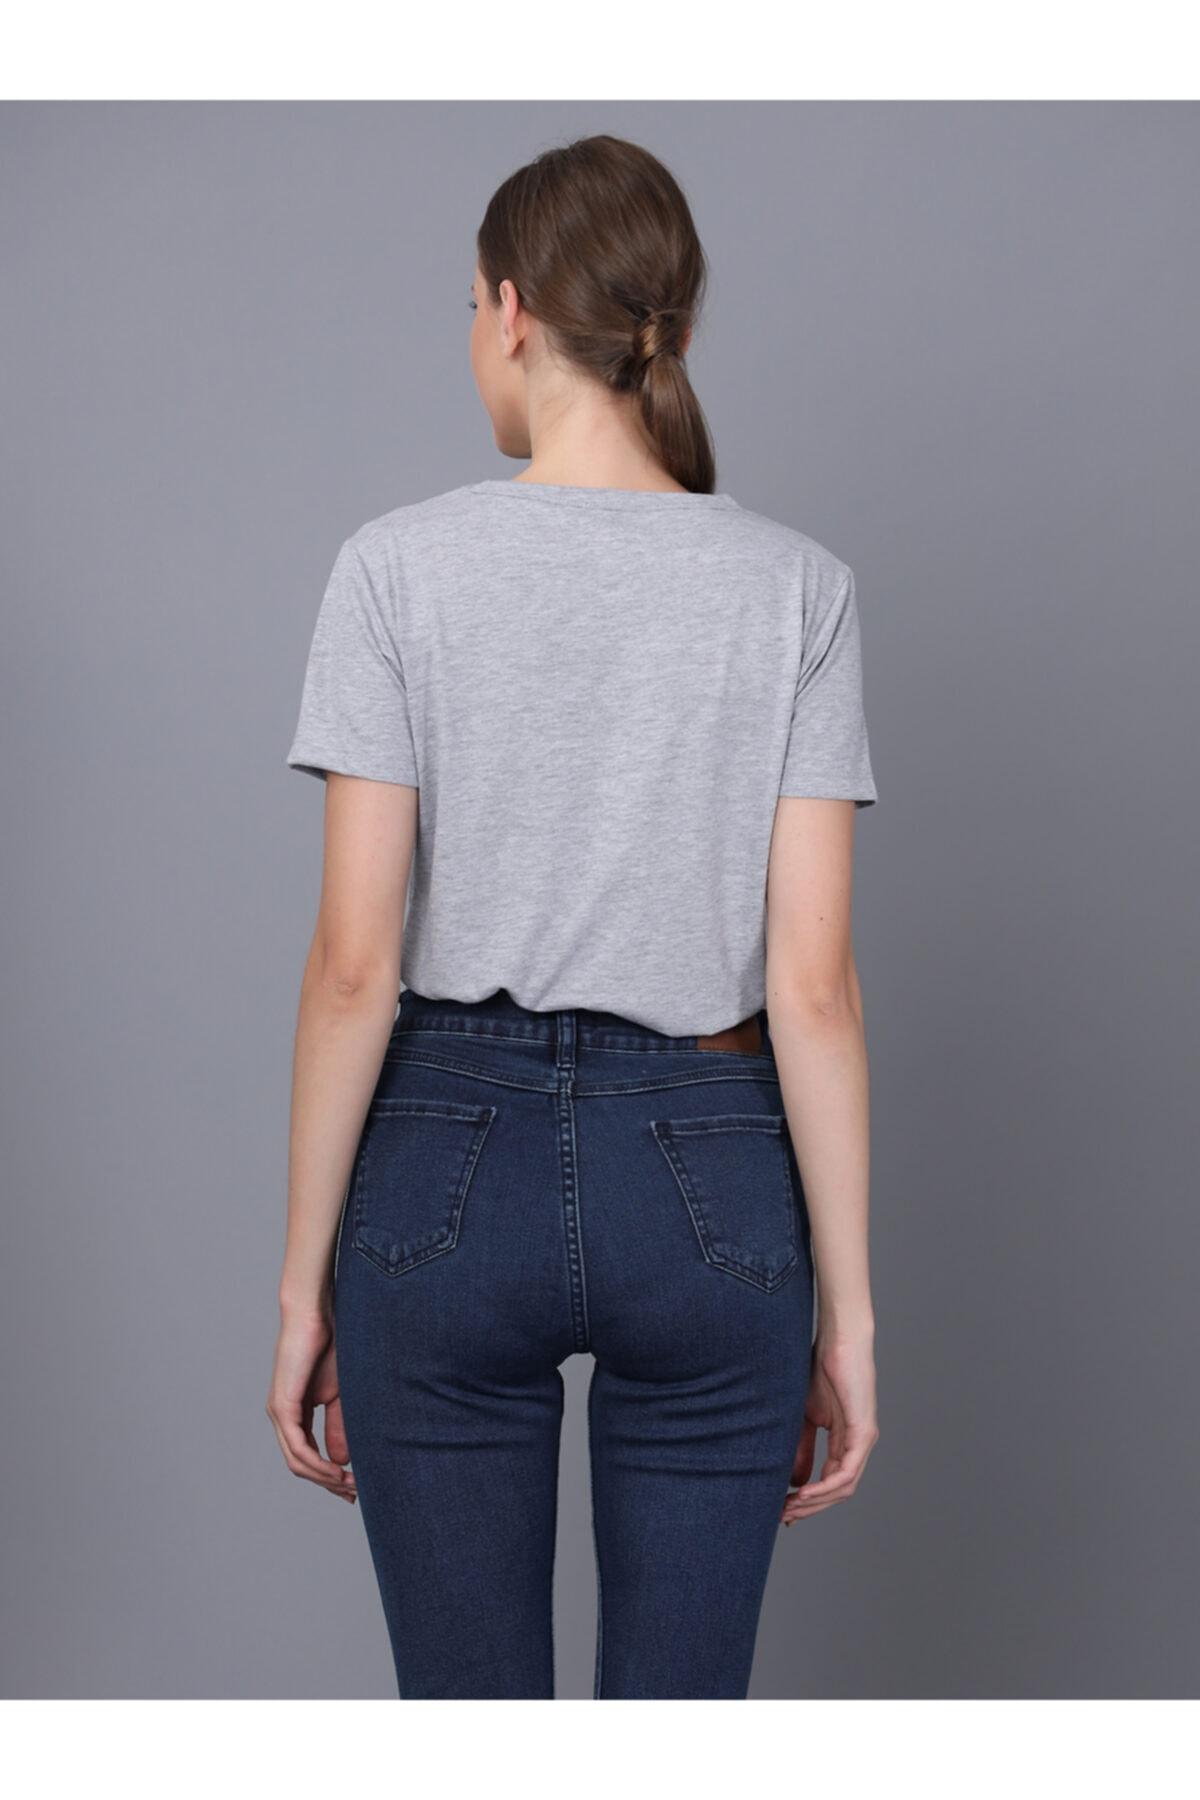 Basics&More Kadın Gri Bisiklet Yaka T-shirt 2